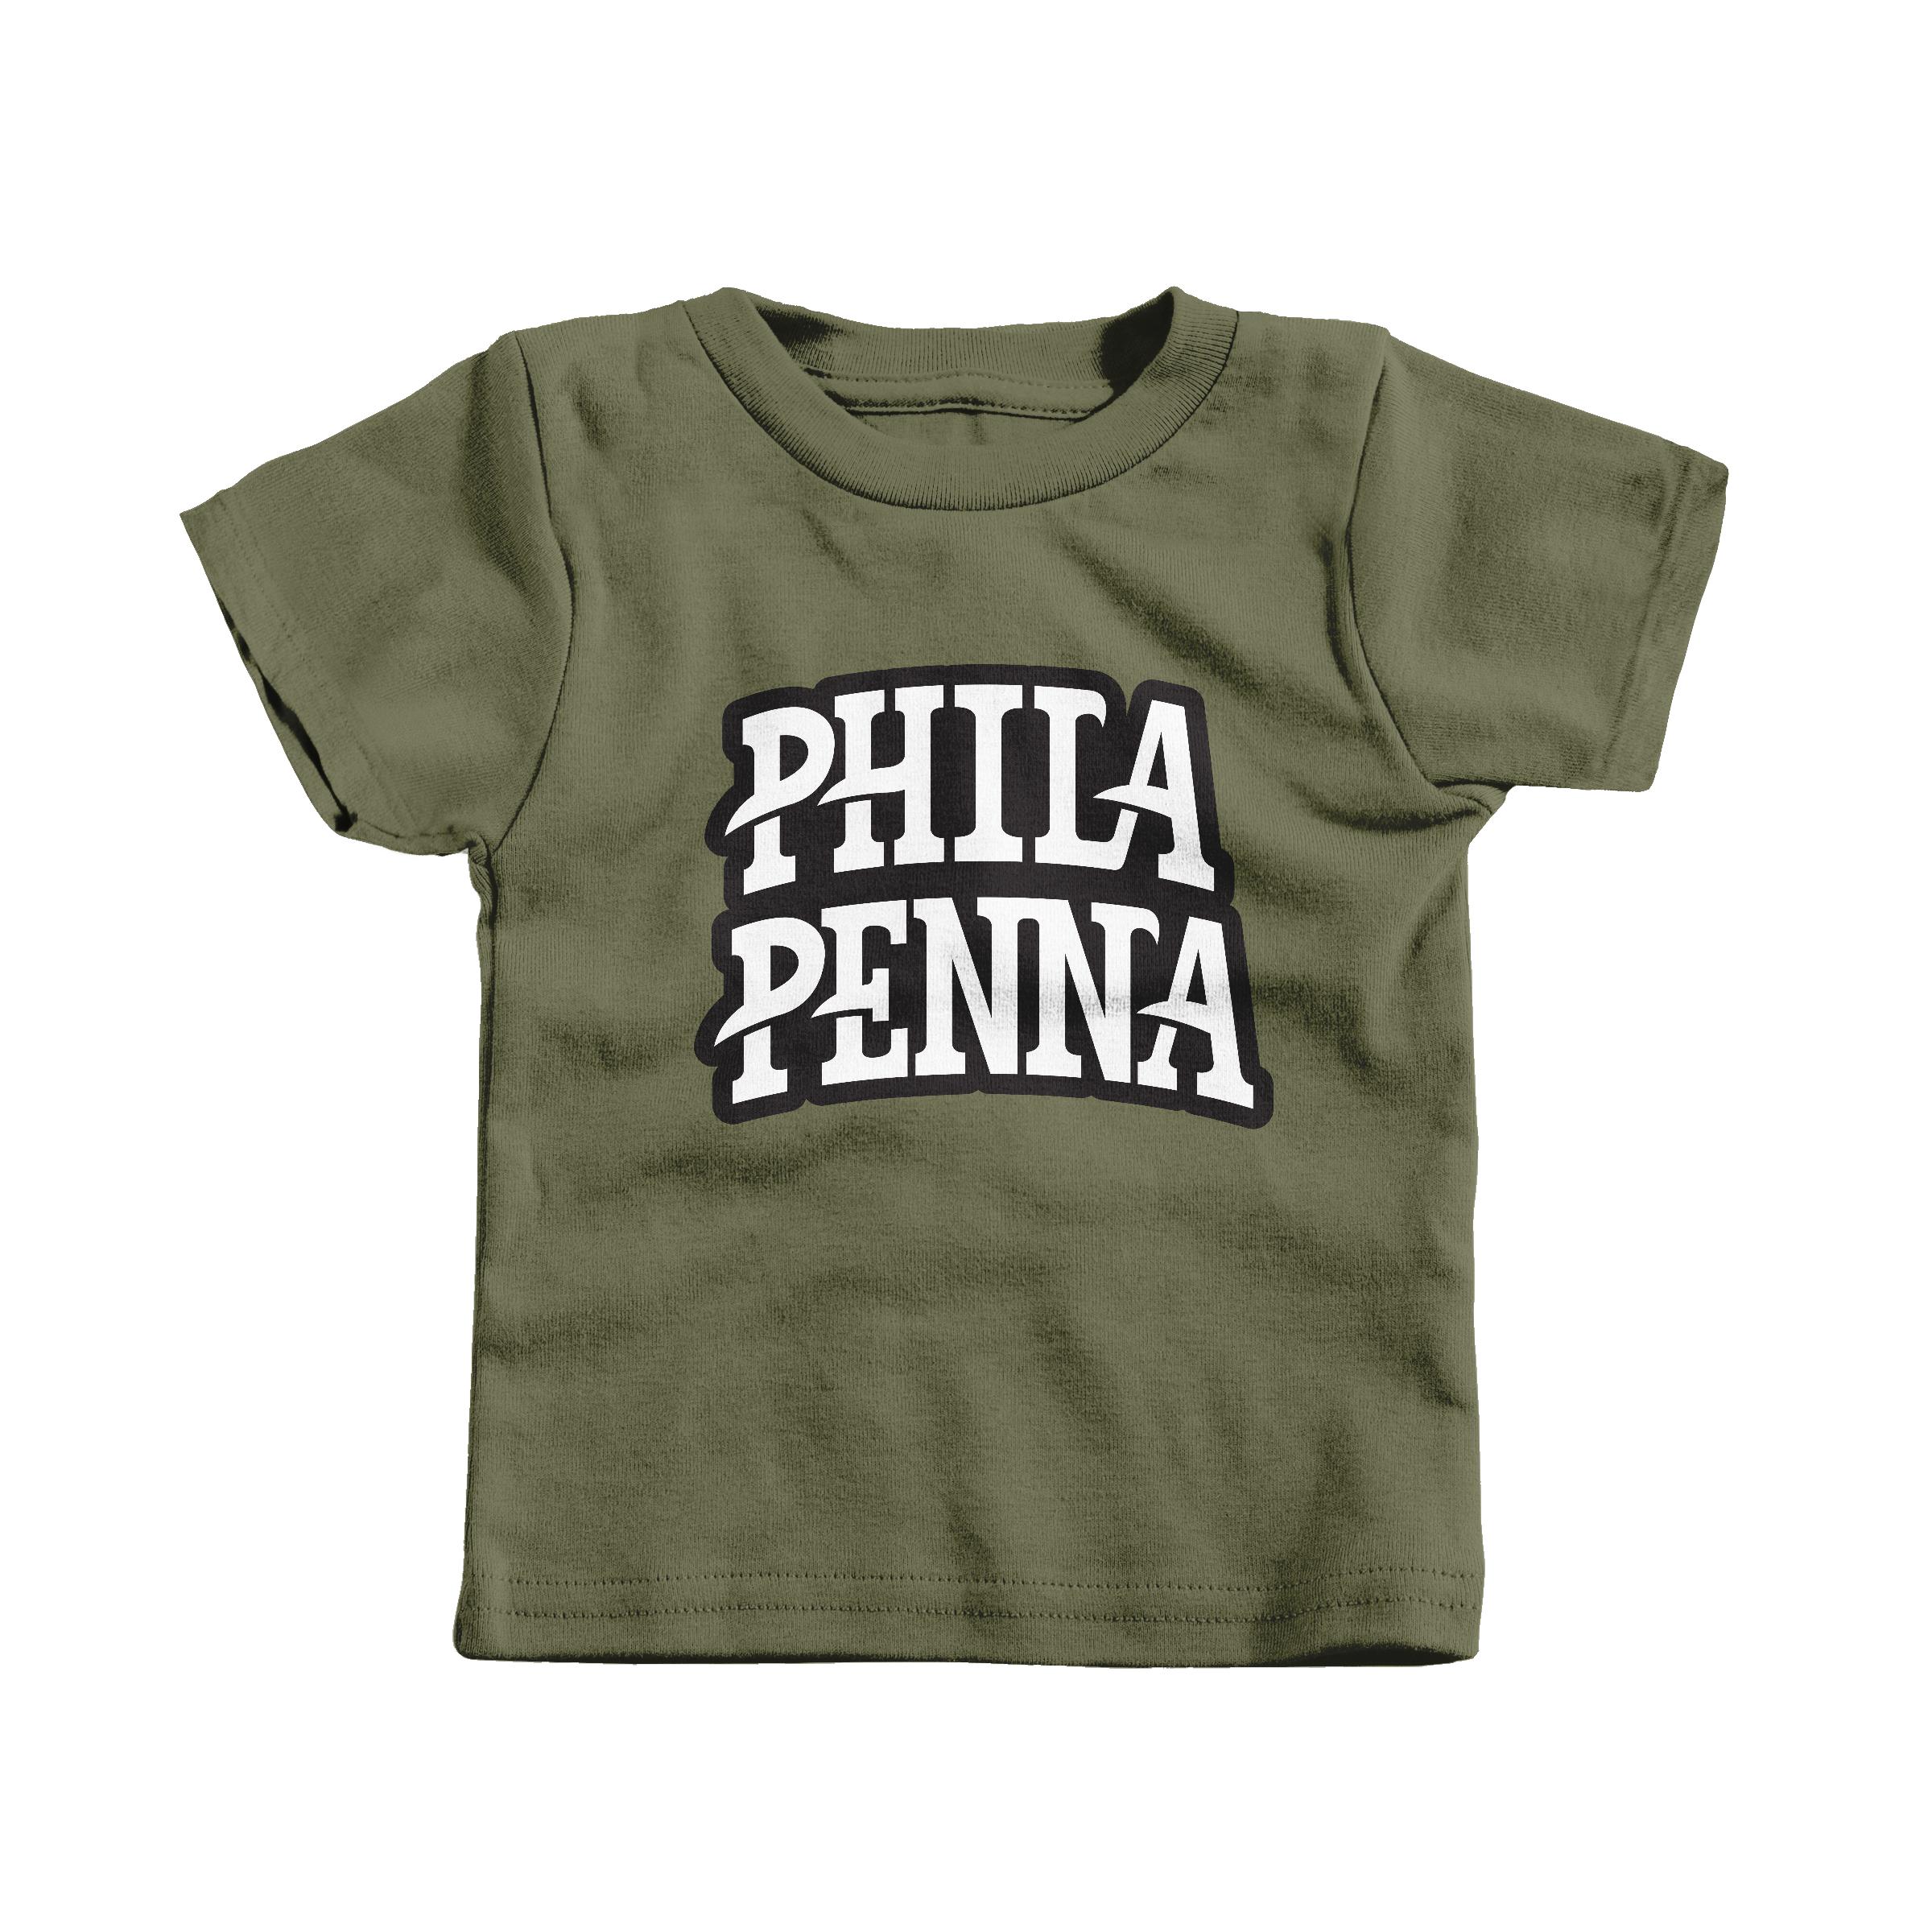 Phila. Penna.